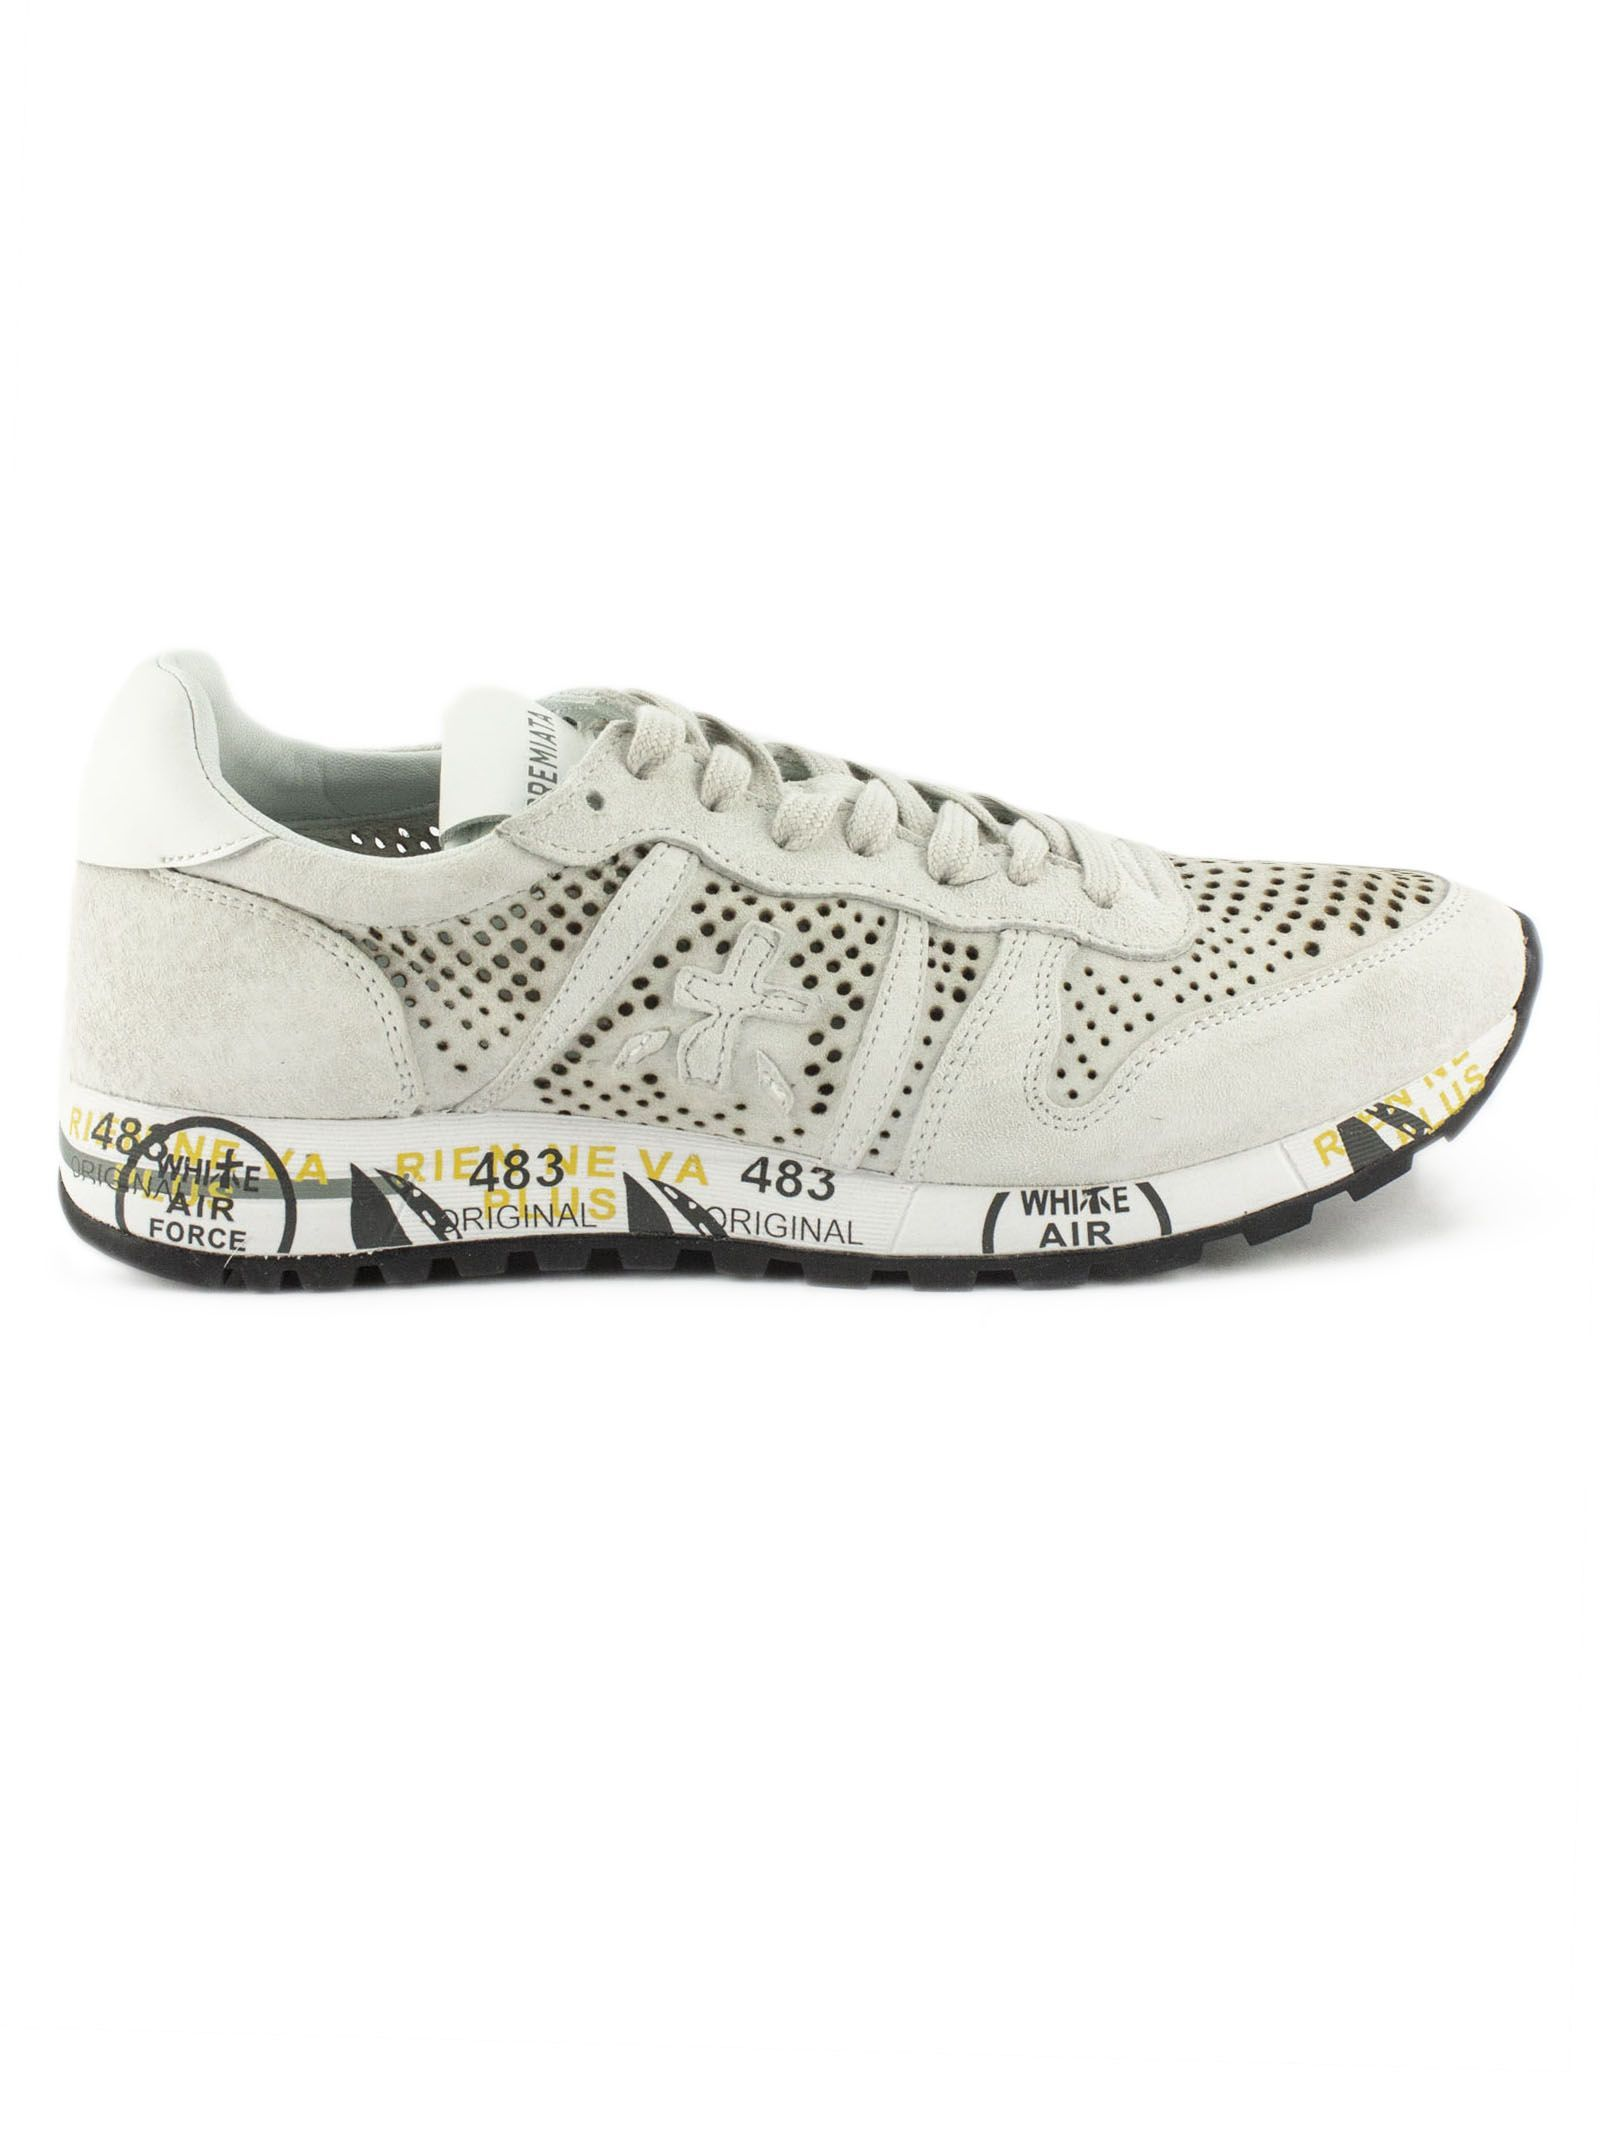 Sneaker Upperpremiatashoes Premiata In Eric Beige Suede 9DHIYEW2